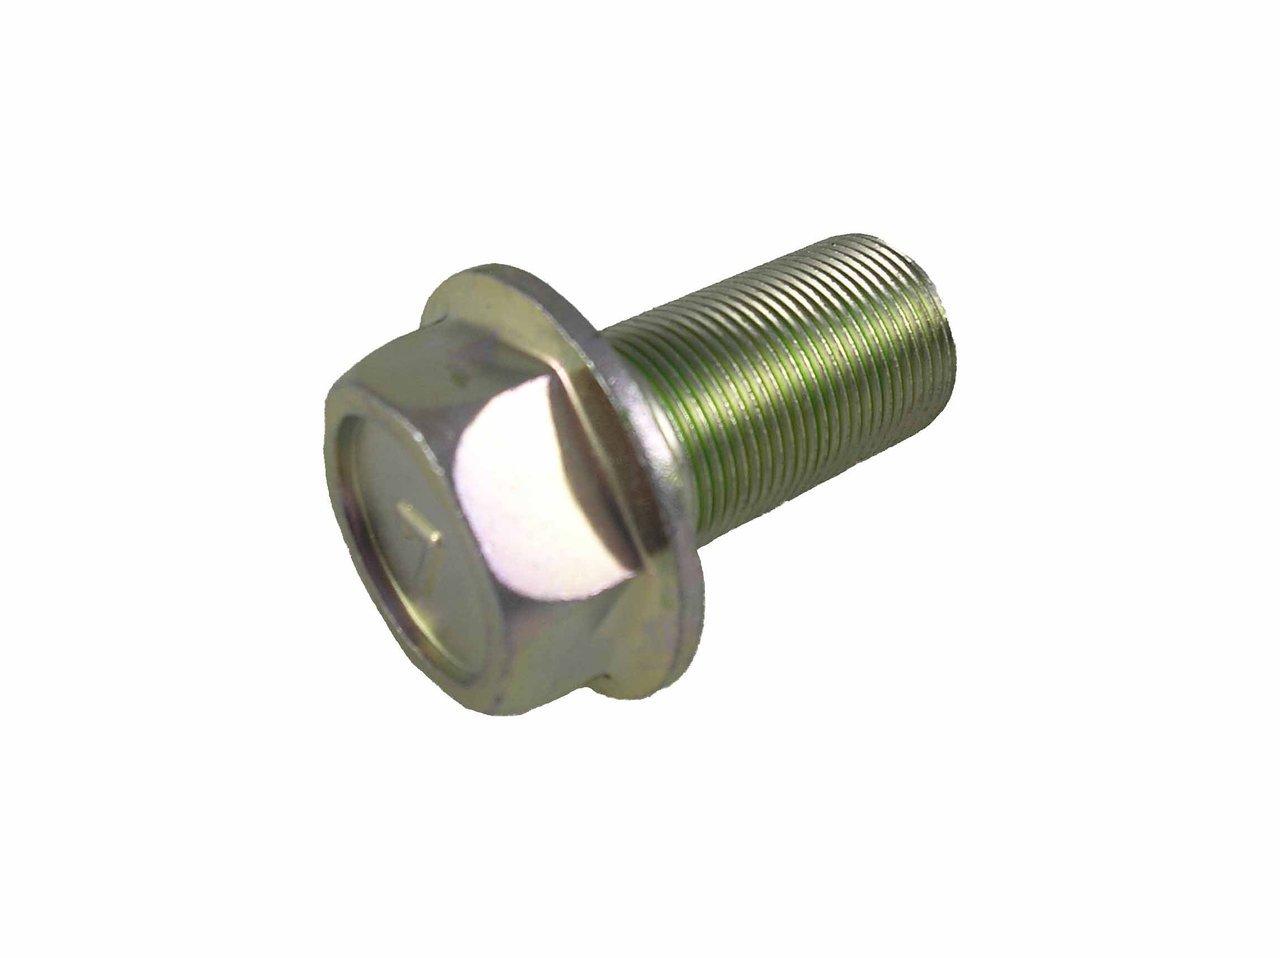 Harmonic Balancer Crank Pulley Bolt suitable for Landcruiser 1HZ 1HDT 4 2  Diesel